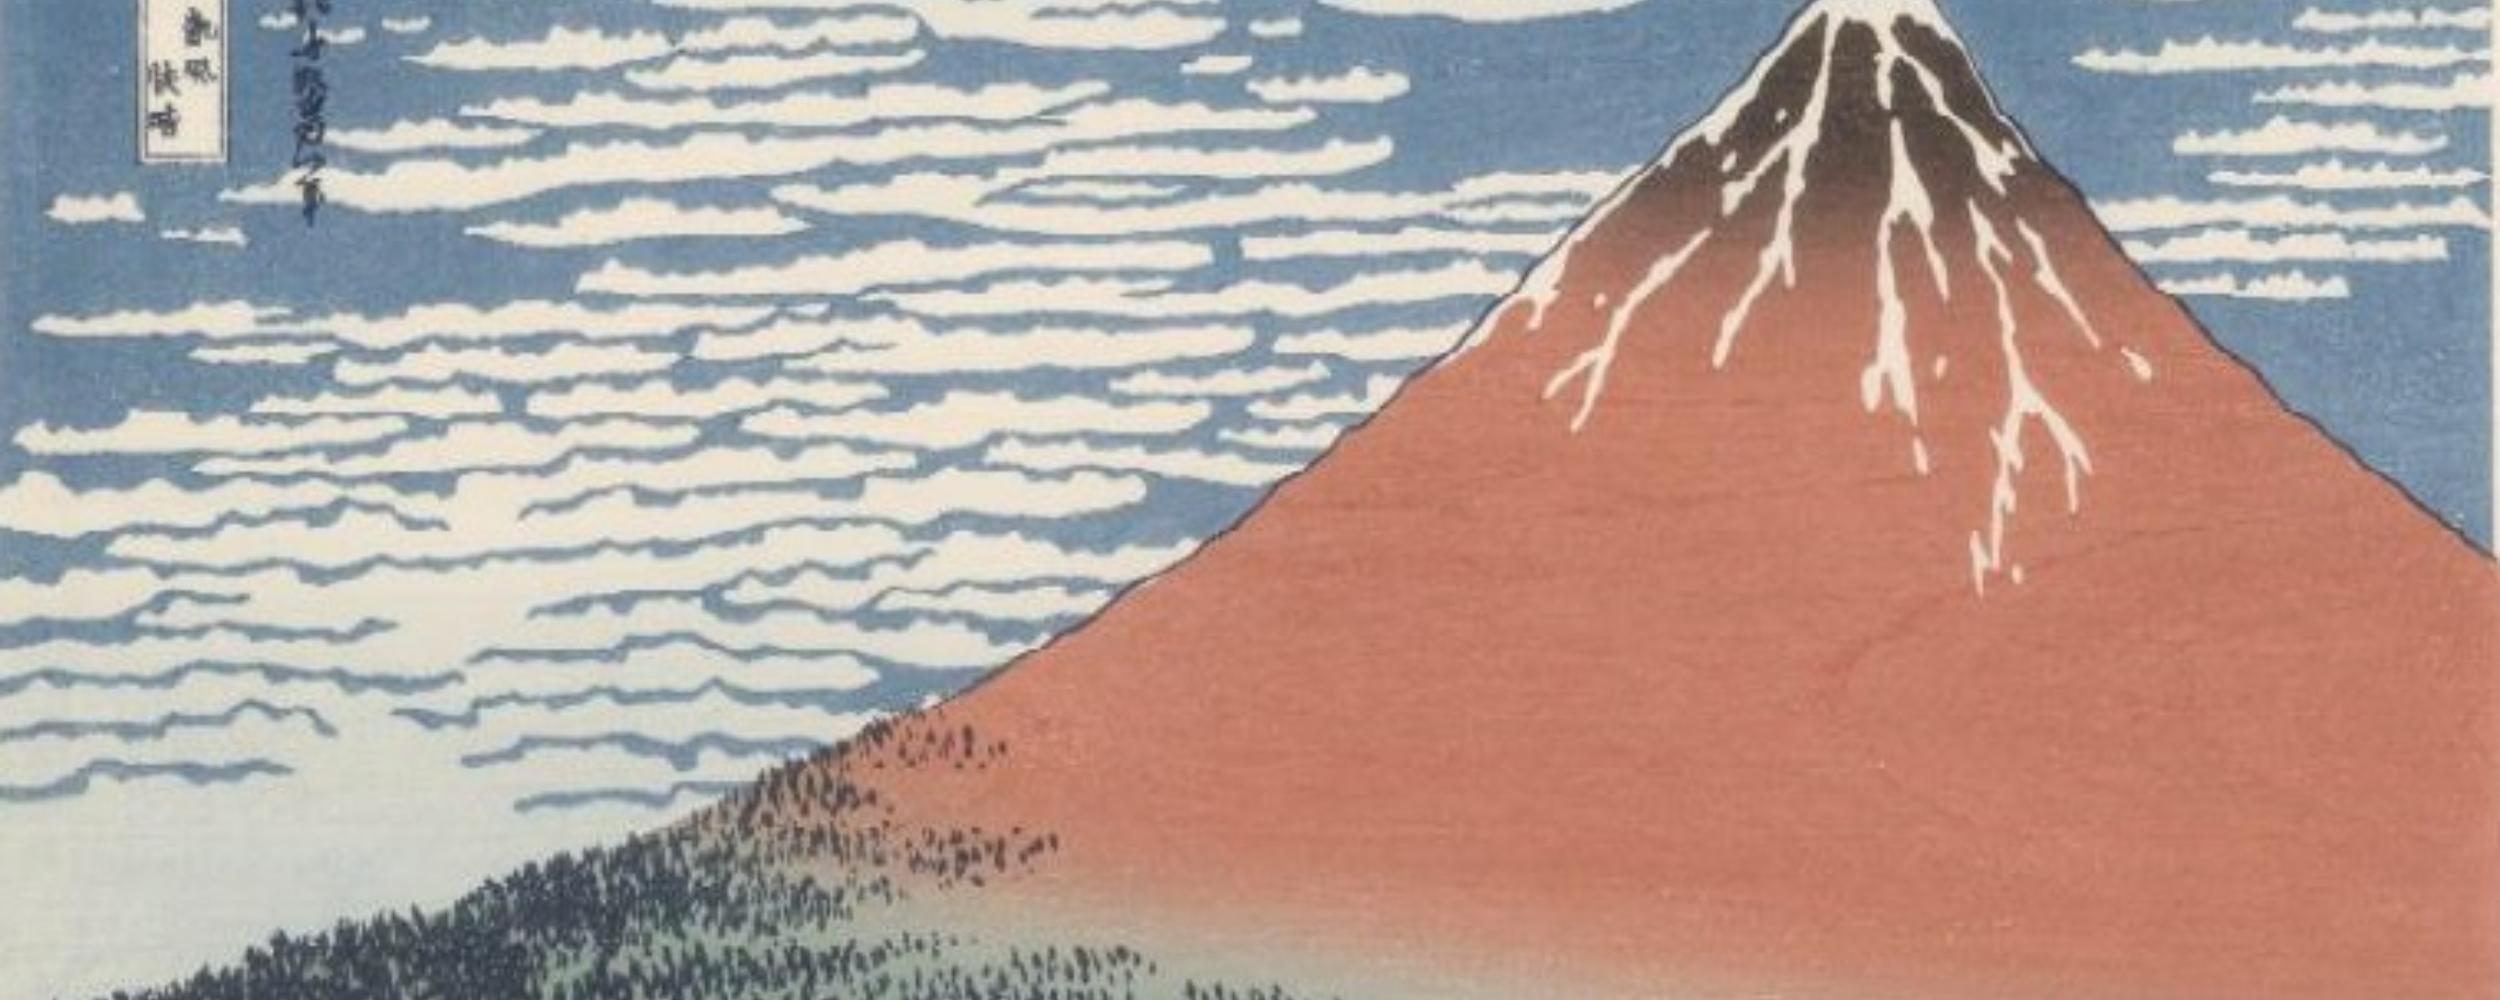 Japan  Mt  Fuji  Hokusai